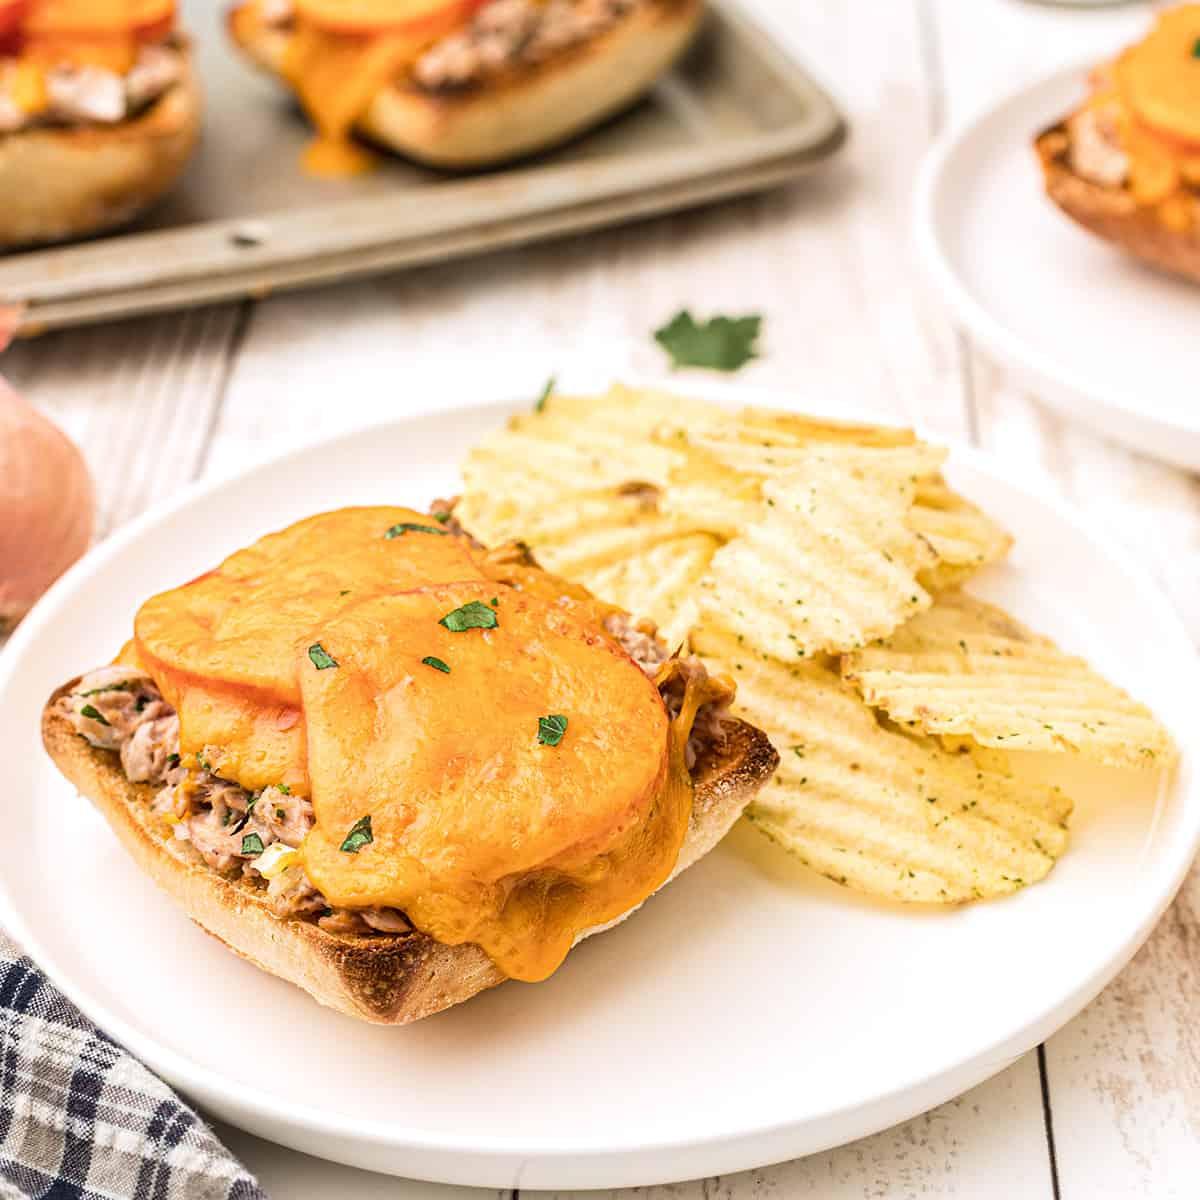 Tuna melt sandwich with potato chips on a white plate.